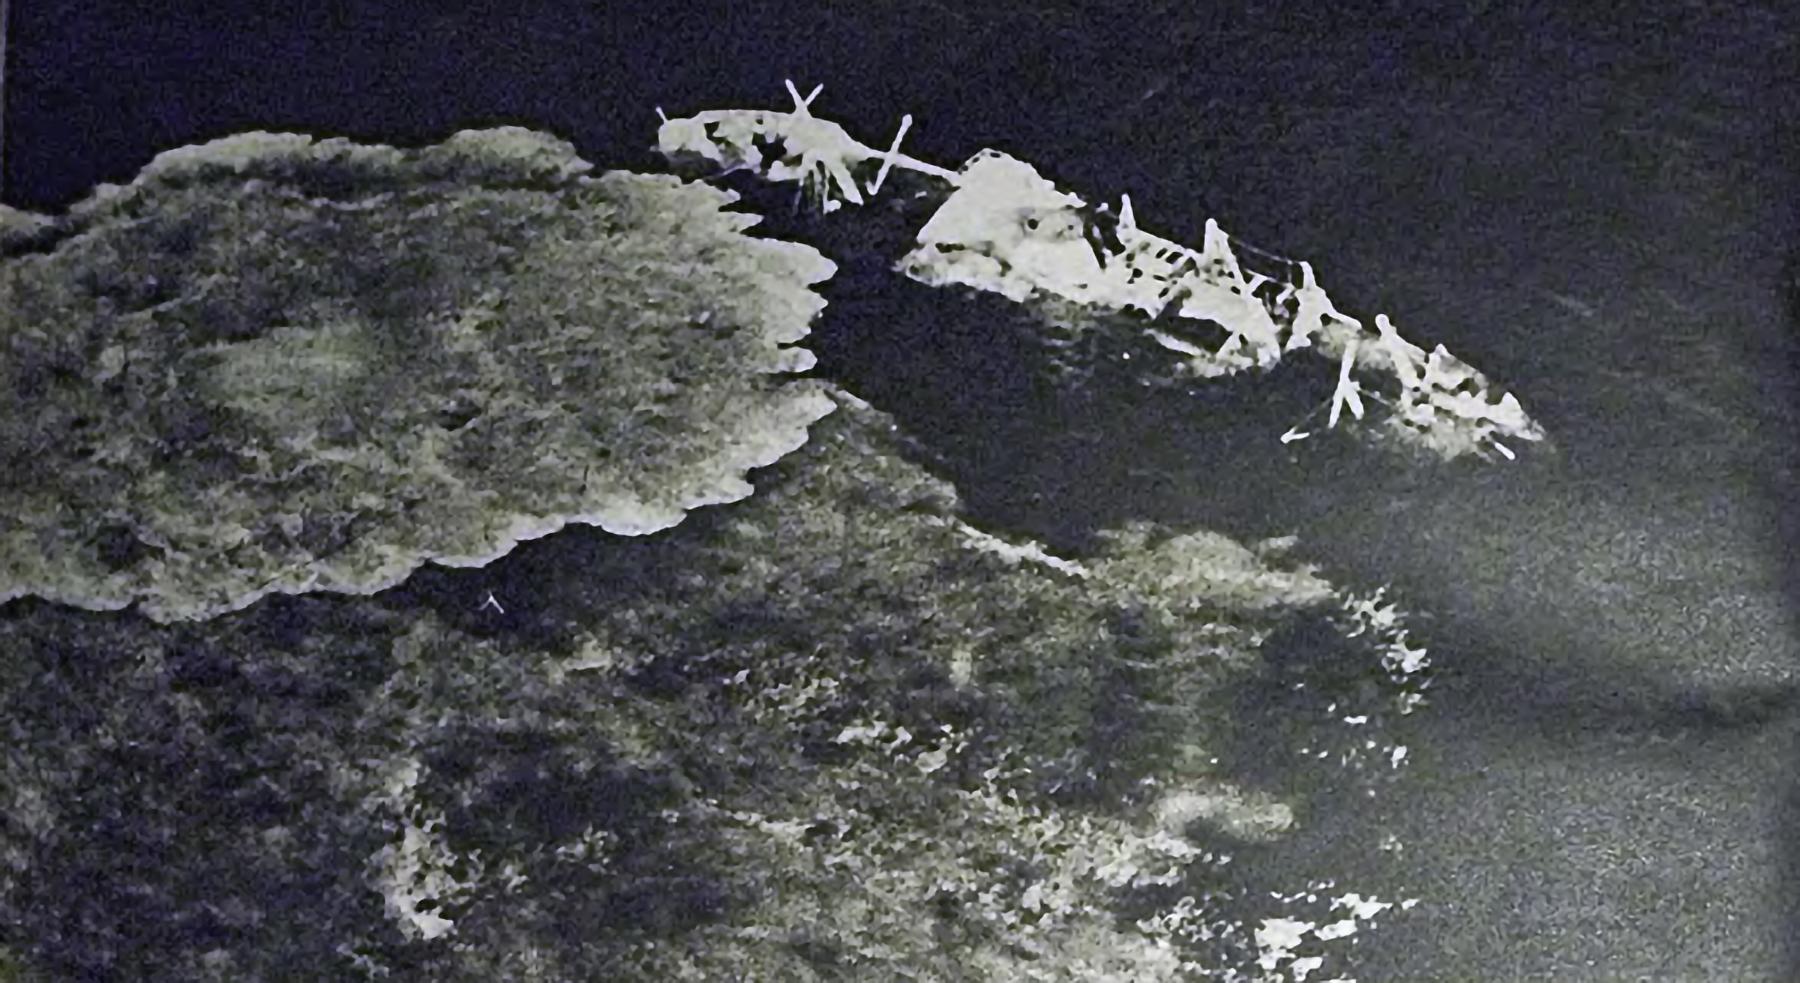 Royal Navy merchantman sinking off Tobruk after a Luftwaffe attack 1941 01